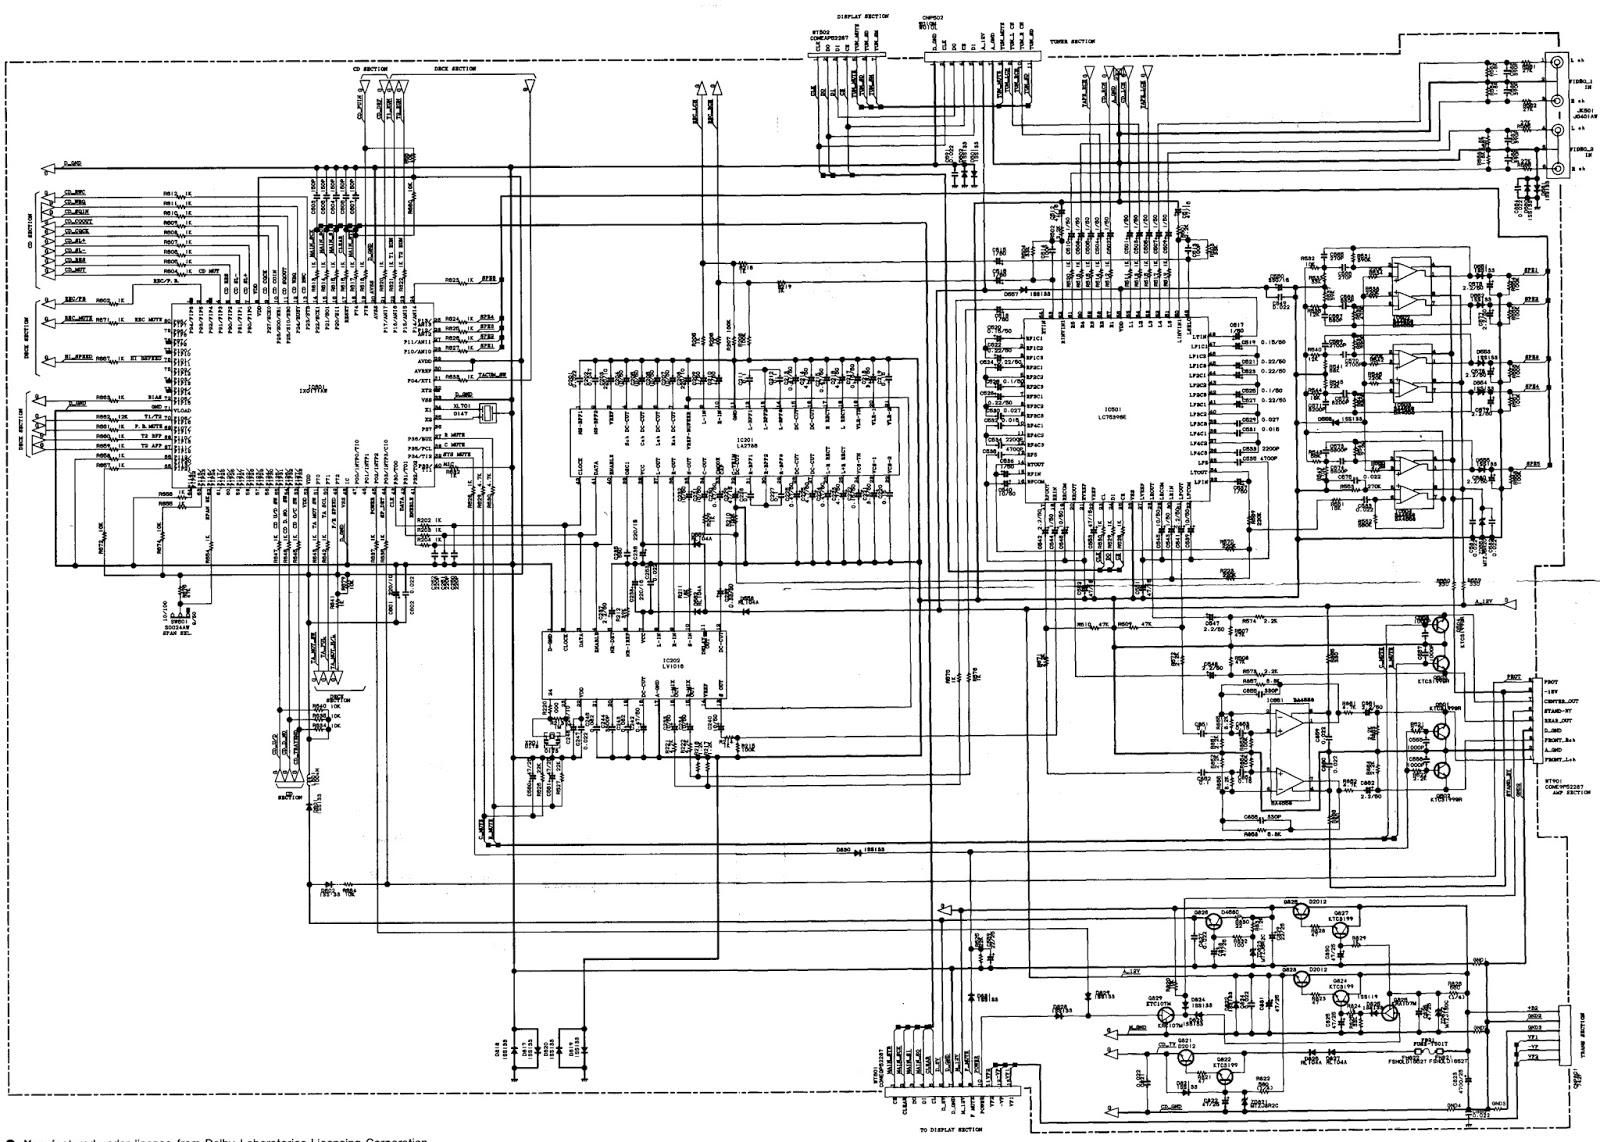 Electro Help  Sharp Cd C-470 - Schematic  Circuit Diagram